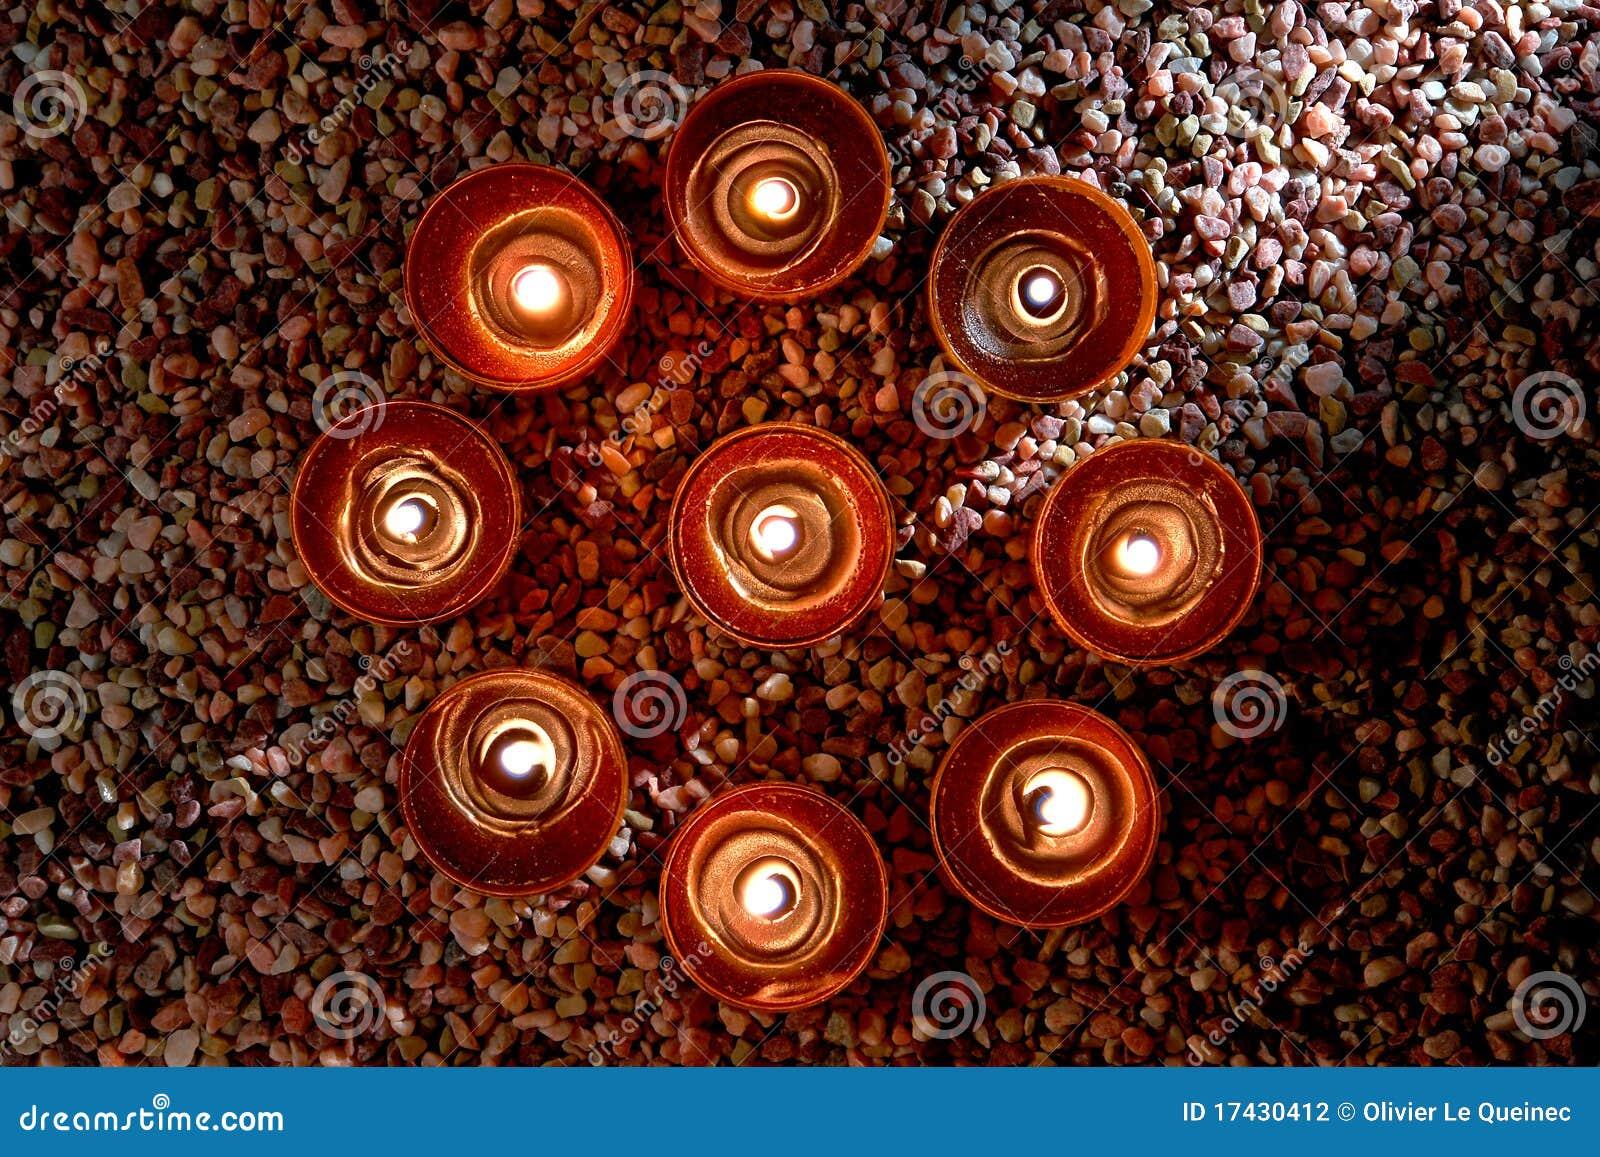 Velas Votive que queimam-se no círculo espiritual